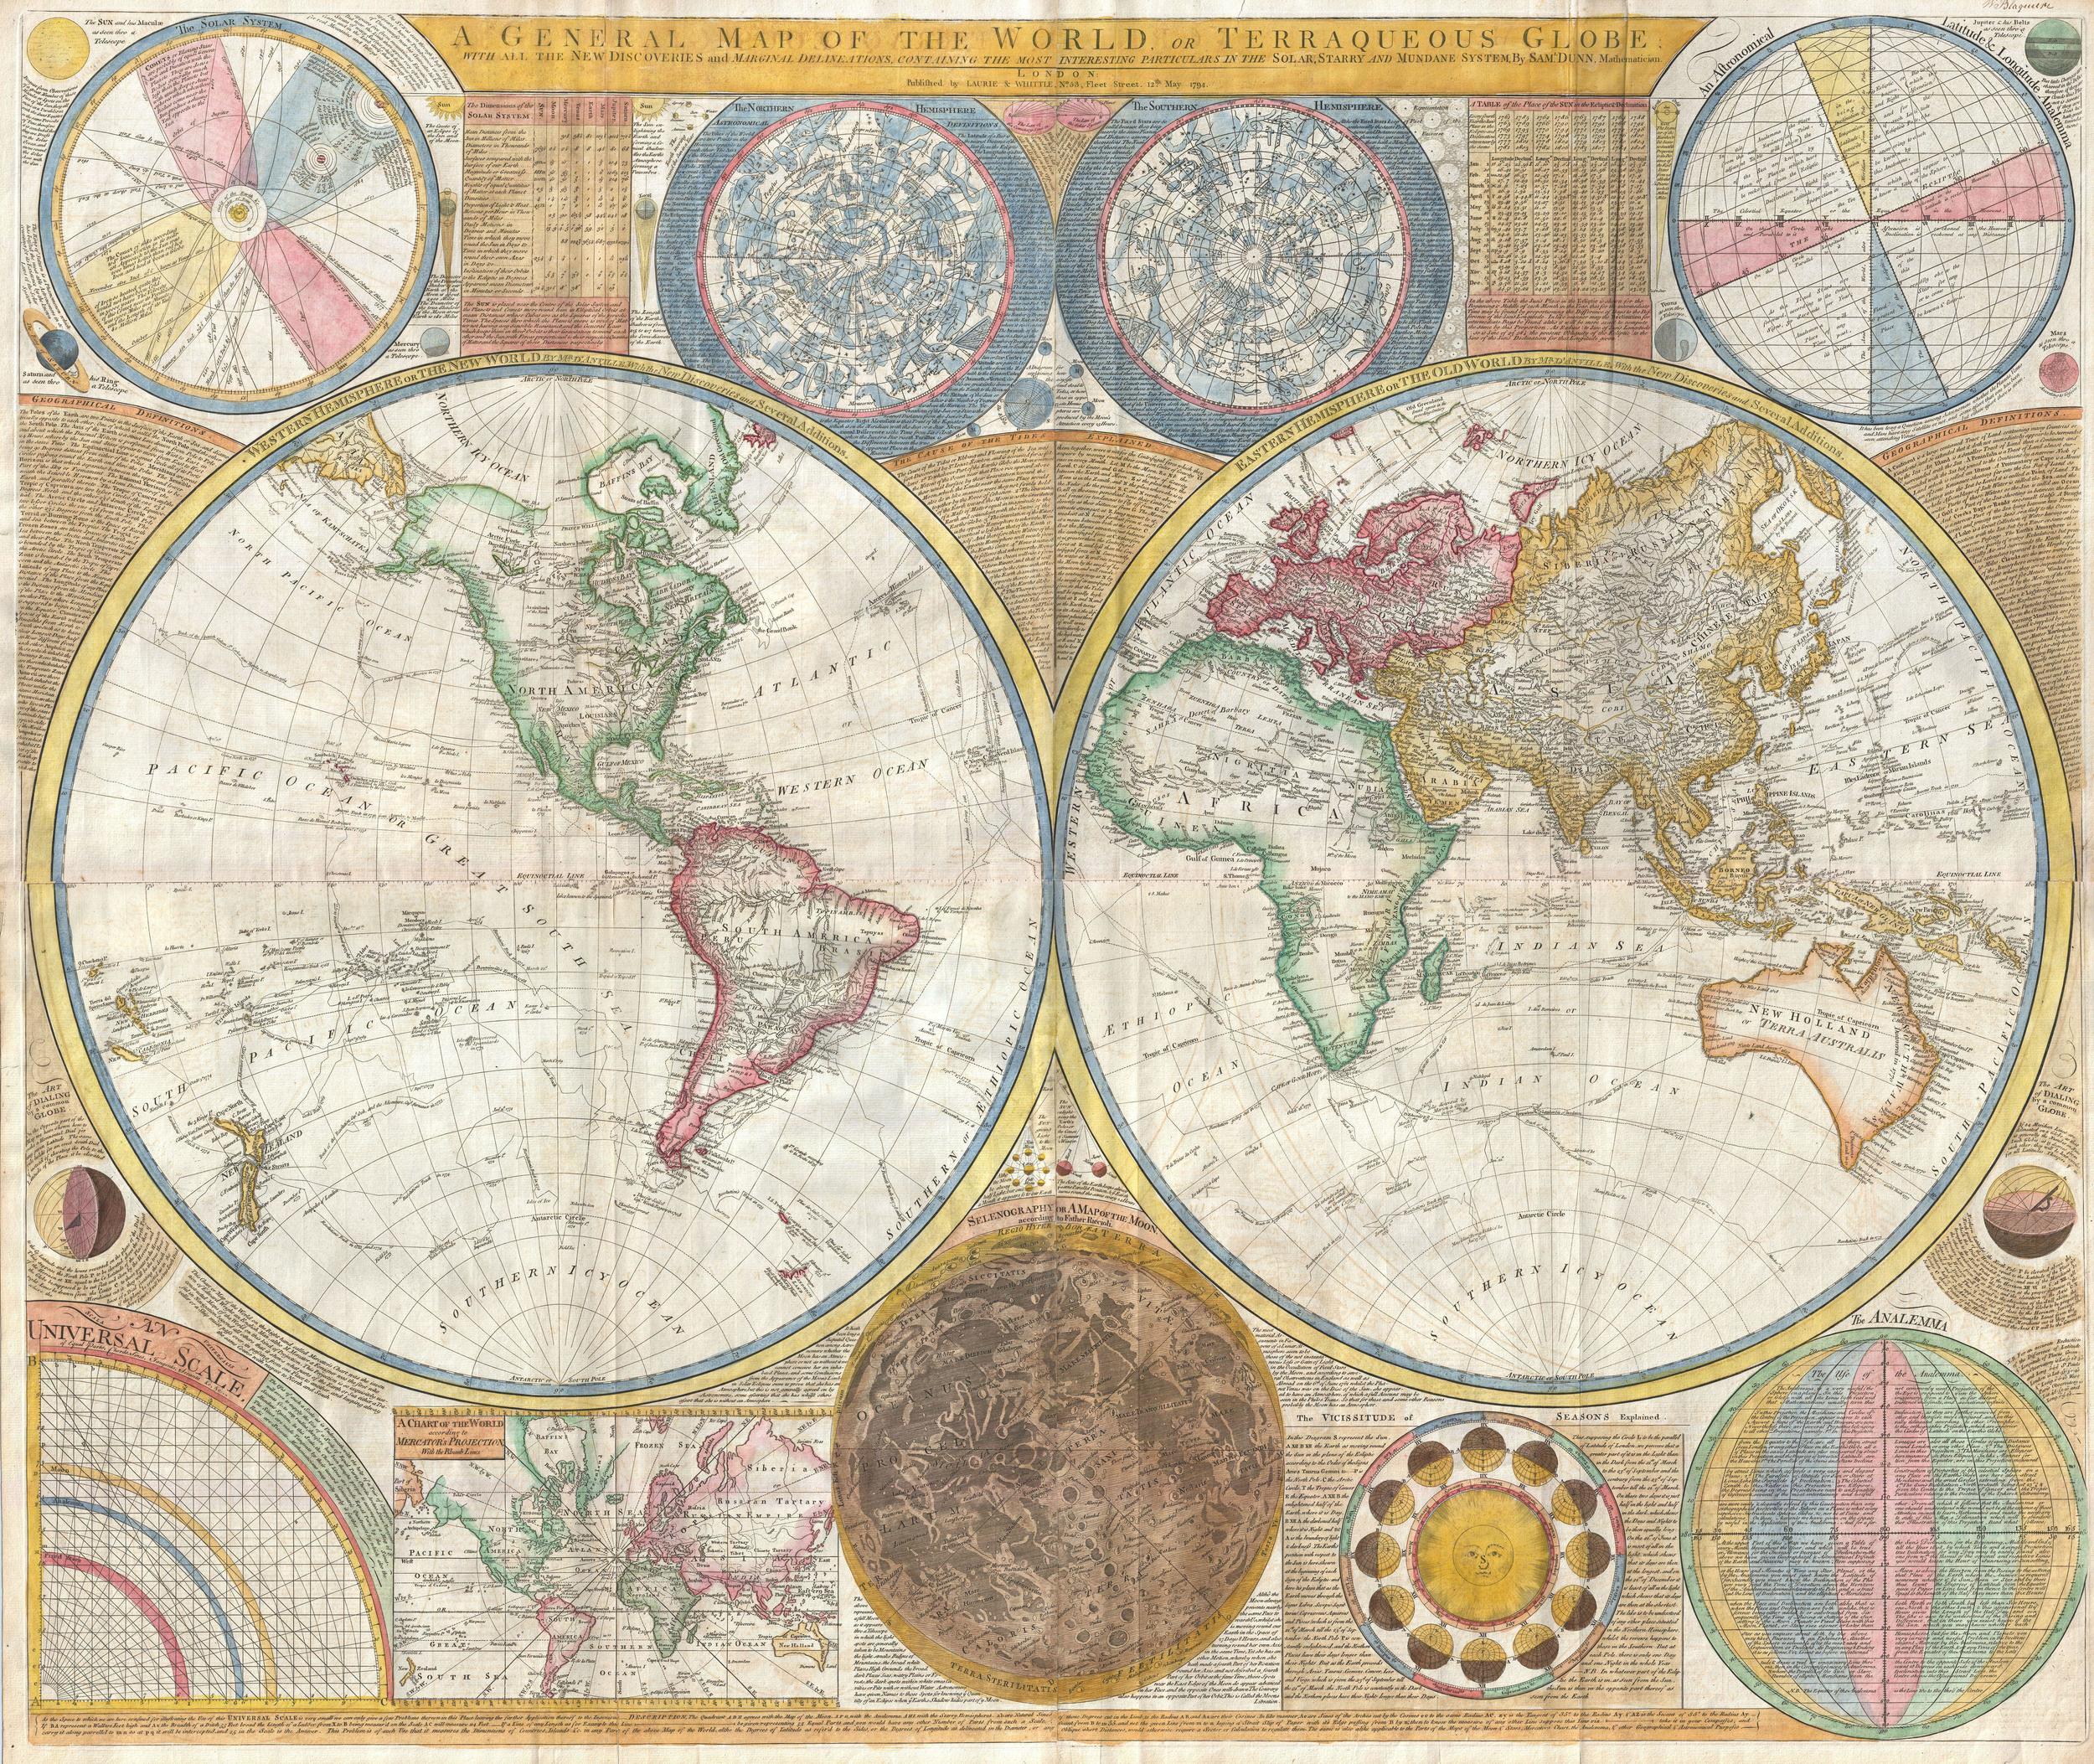 One1794_Samuel_Dunn_Wall_Map_of_the_World_in_Hemispheres_-_Geographicus_-_World2-dunn-1794.jpg